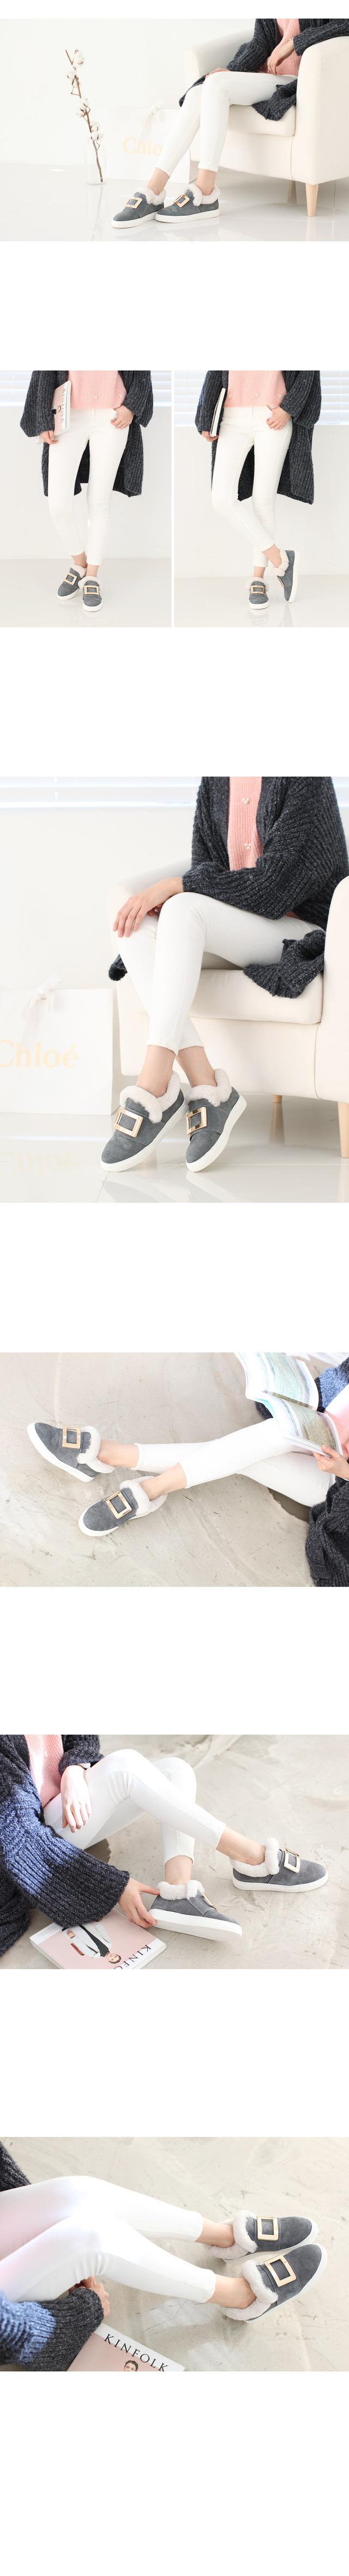 [Leather] Diantha slip-on 2.5cm